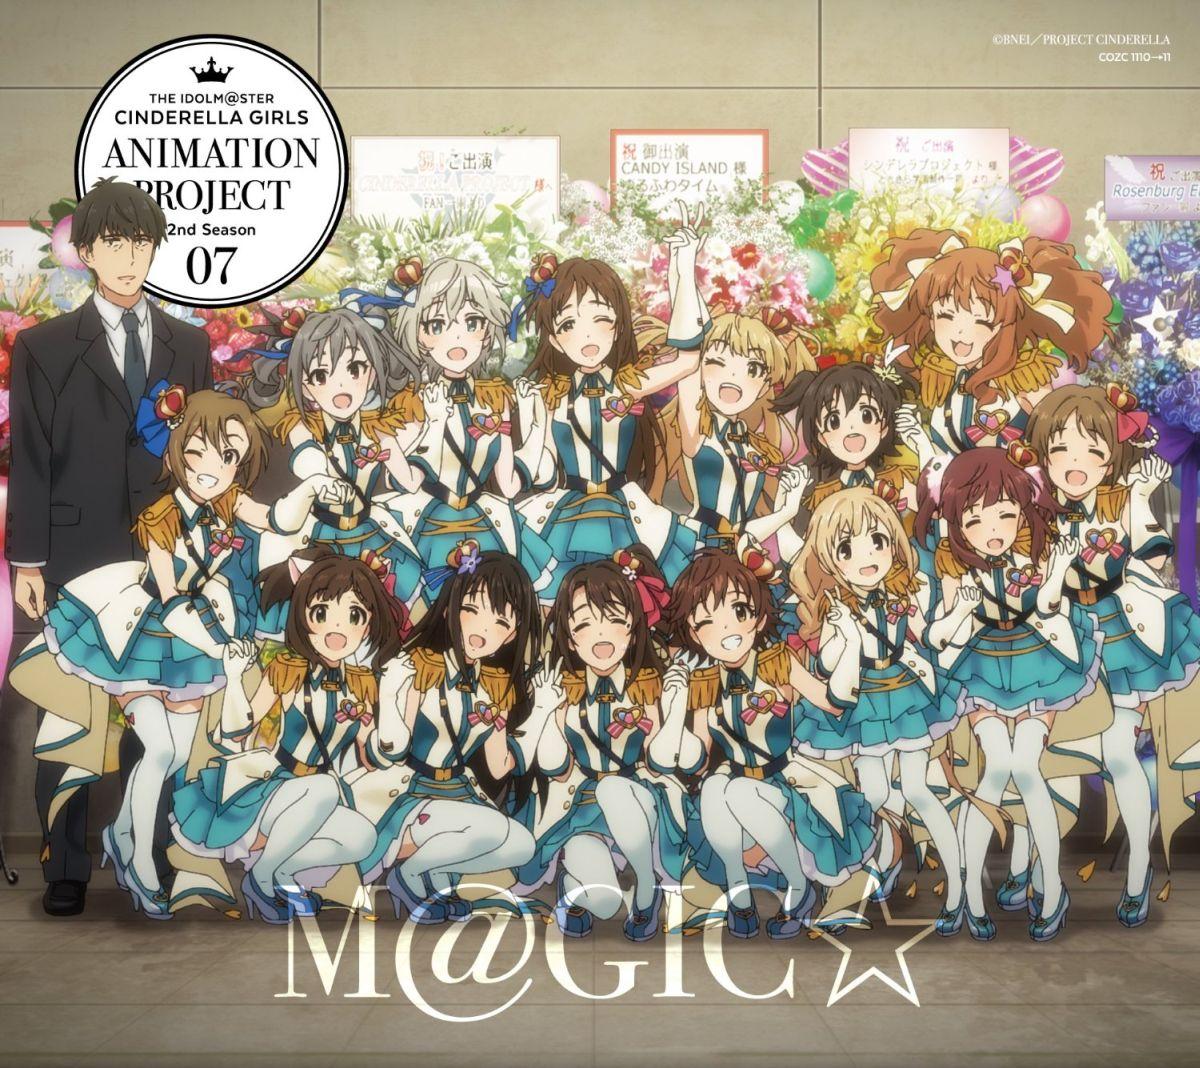 THE IDOLM@STER CINDERELLA GIRLS ANIMATION PROJECT 2nd Season 07 M@GIC☆ (初回限定盤 CD+Blu-ray)画像